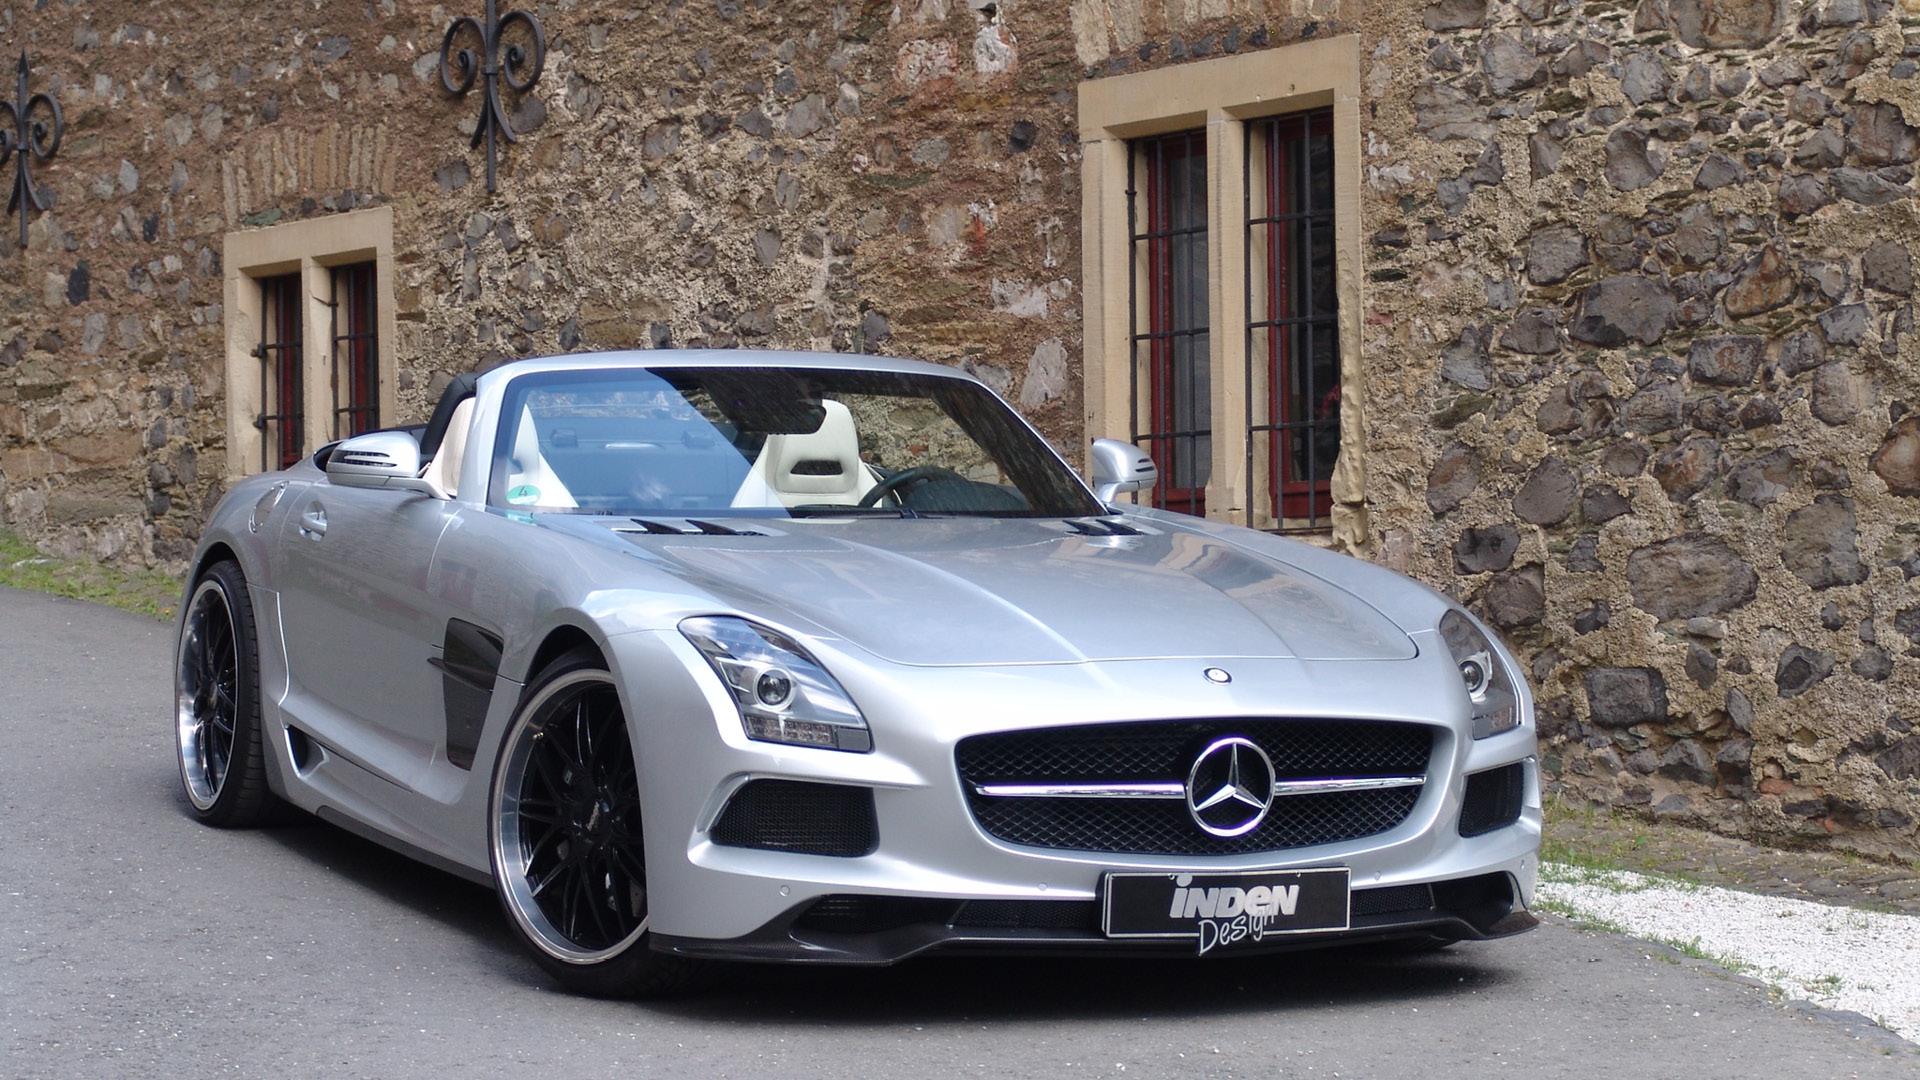 Sls amg black series roadster by binz 39 s inden design for Mercedes benz roadster amg